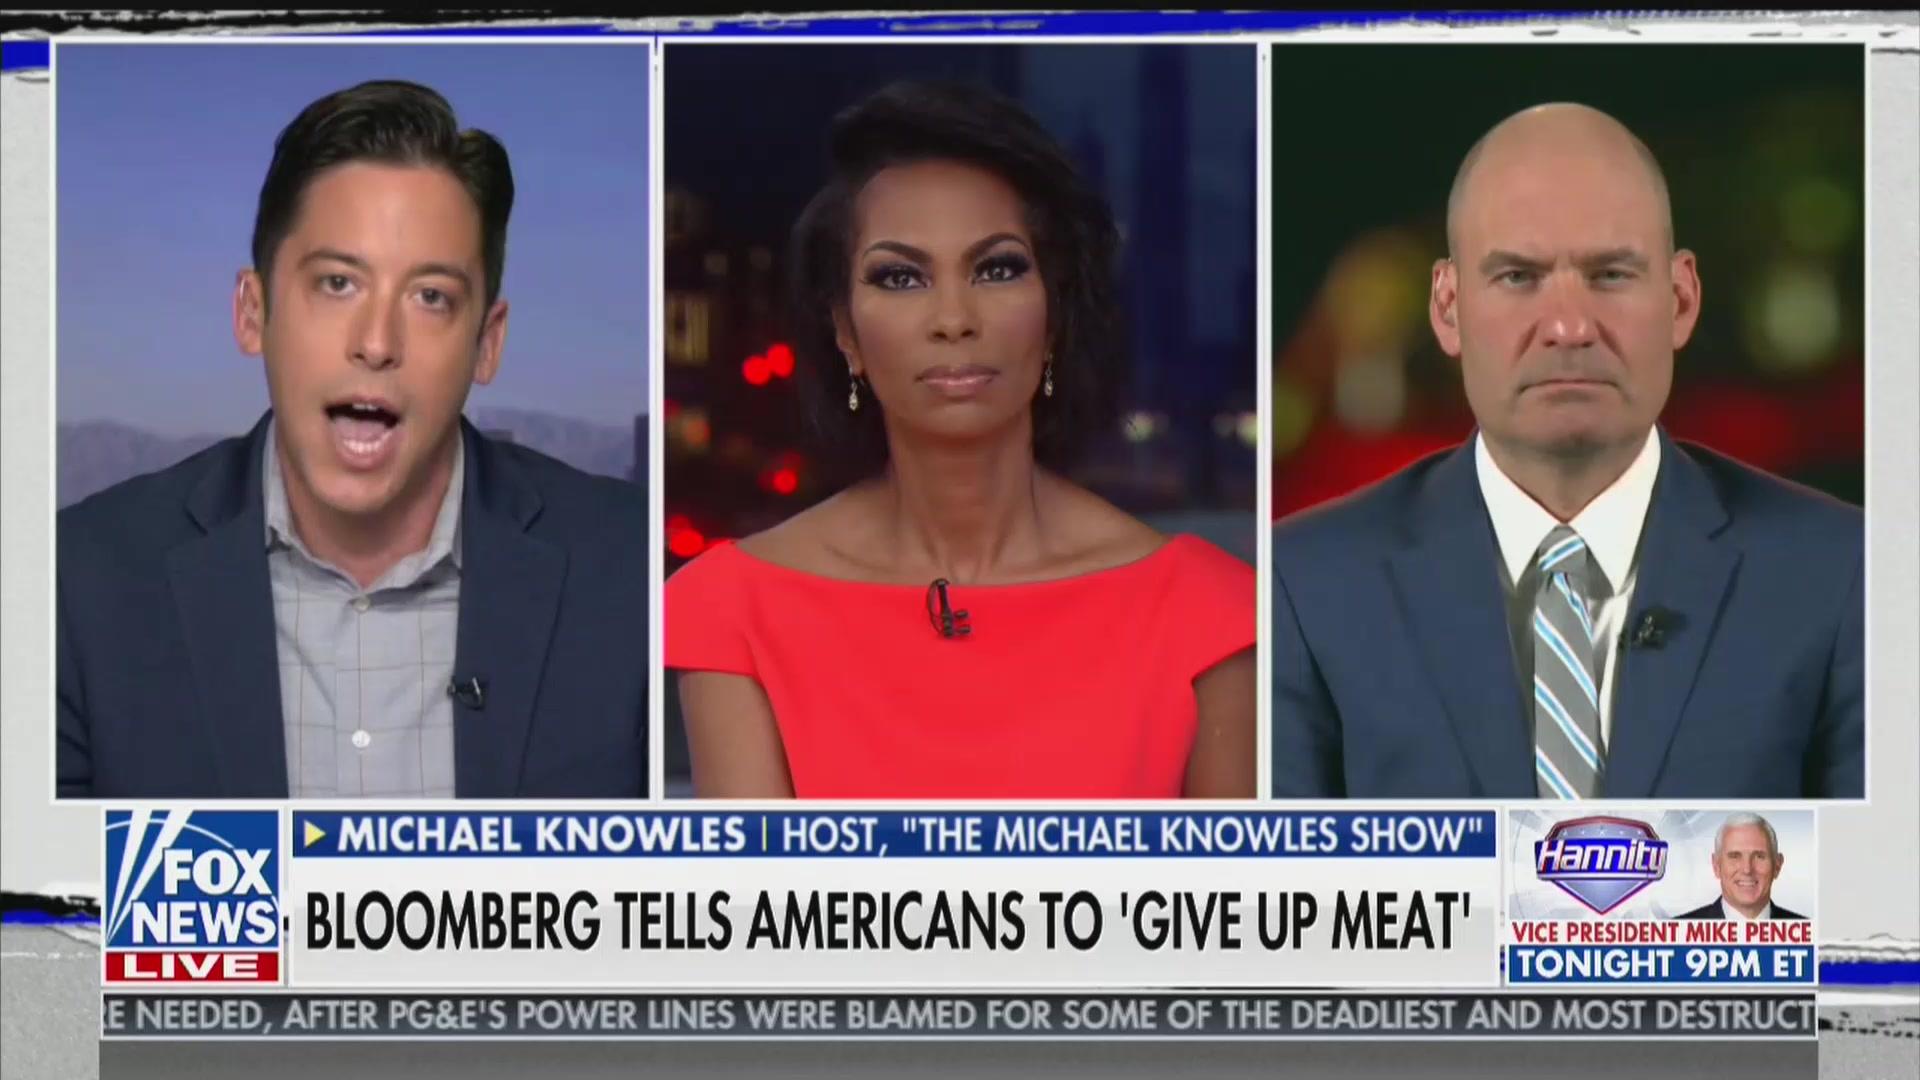 Fox News Guest Michael Knowles Calls Greta Thunberg a 'Mentally Ill Swedish Child'